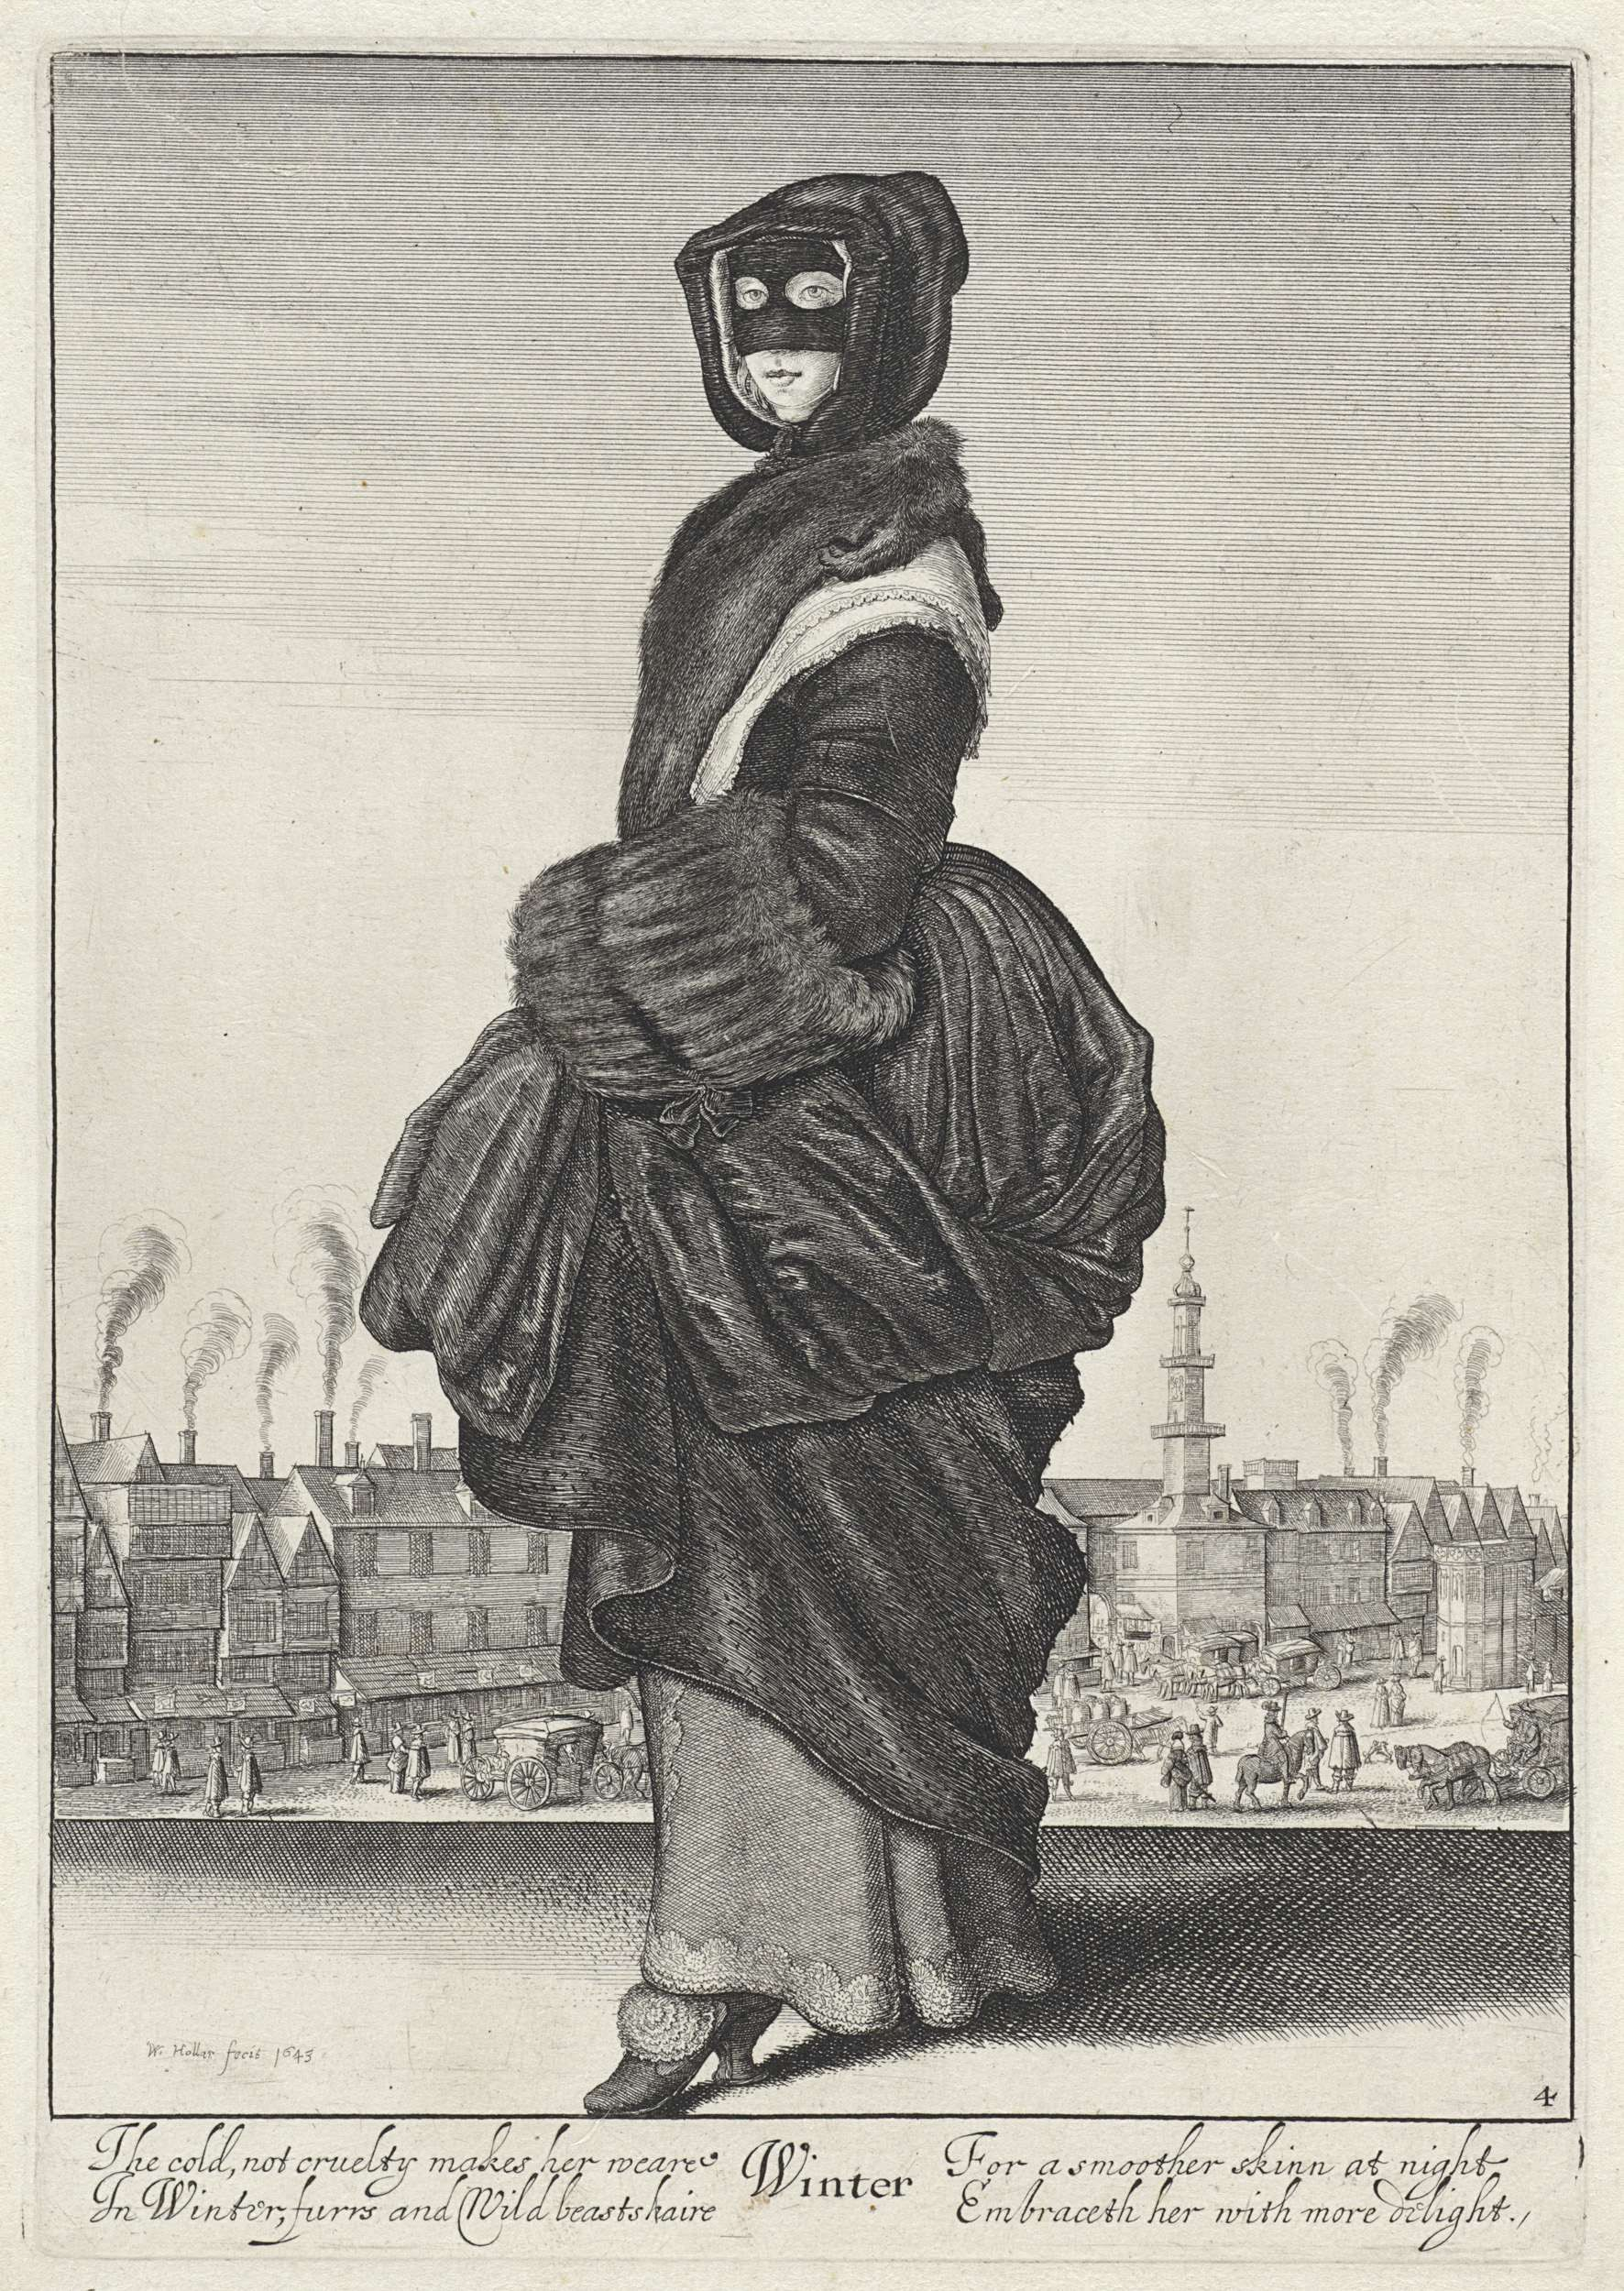 Winter, Wenceslaus Hollar, 1643 New for Now, Rijksmuseum zomer 2015